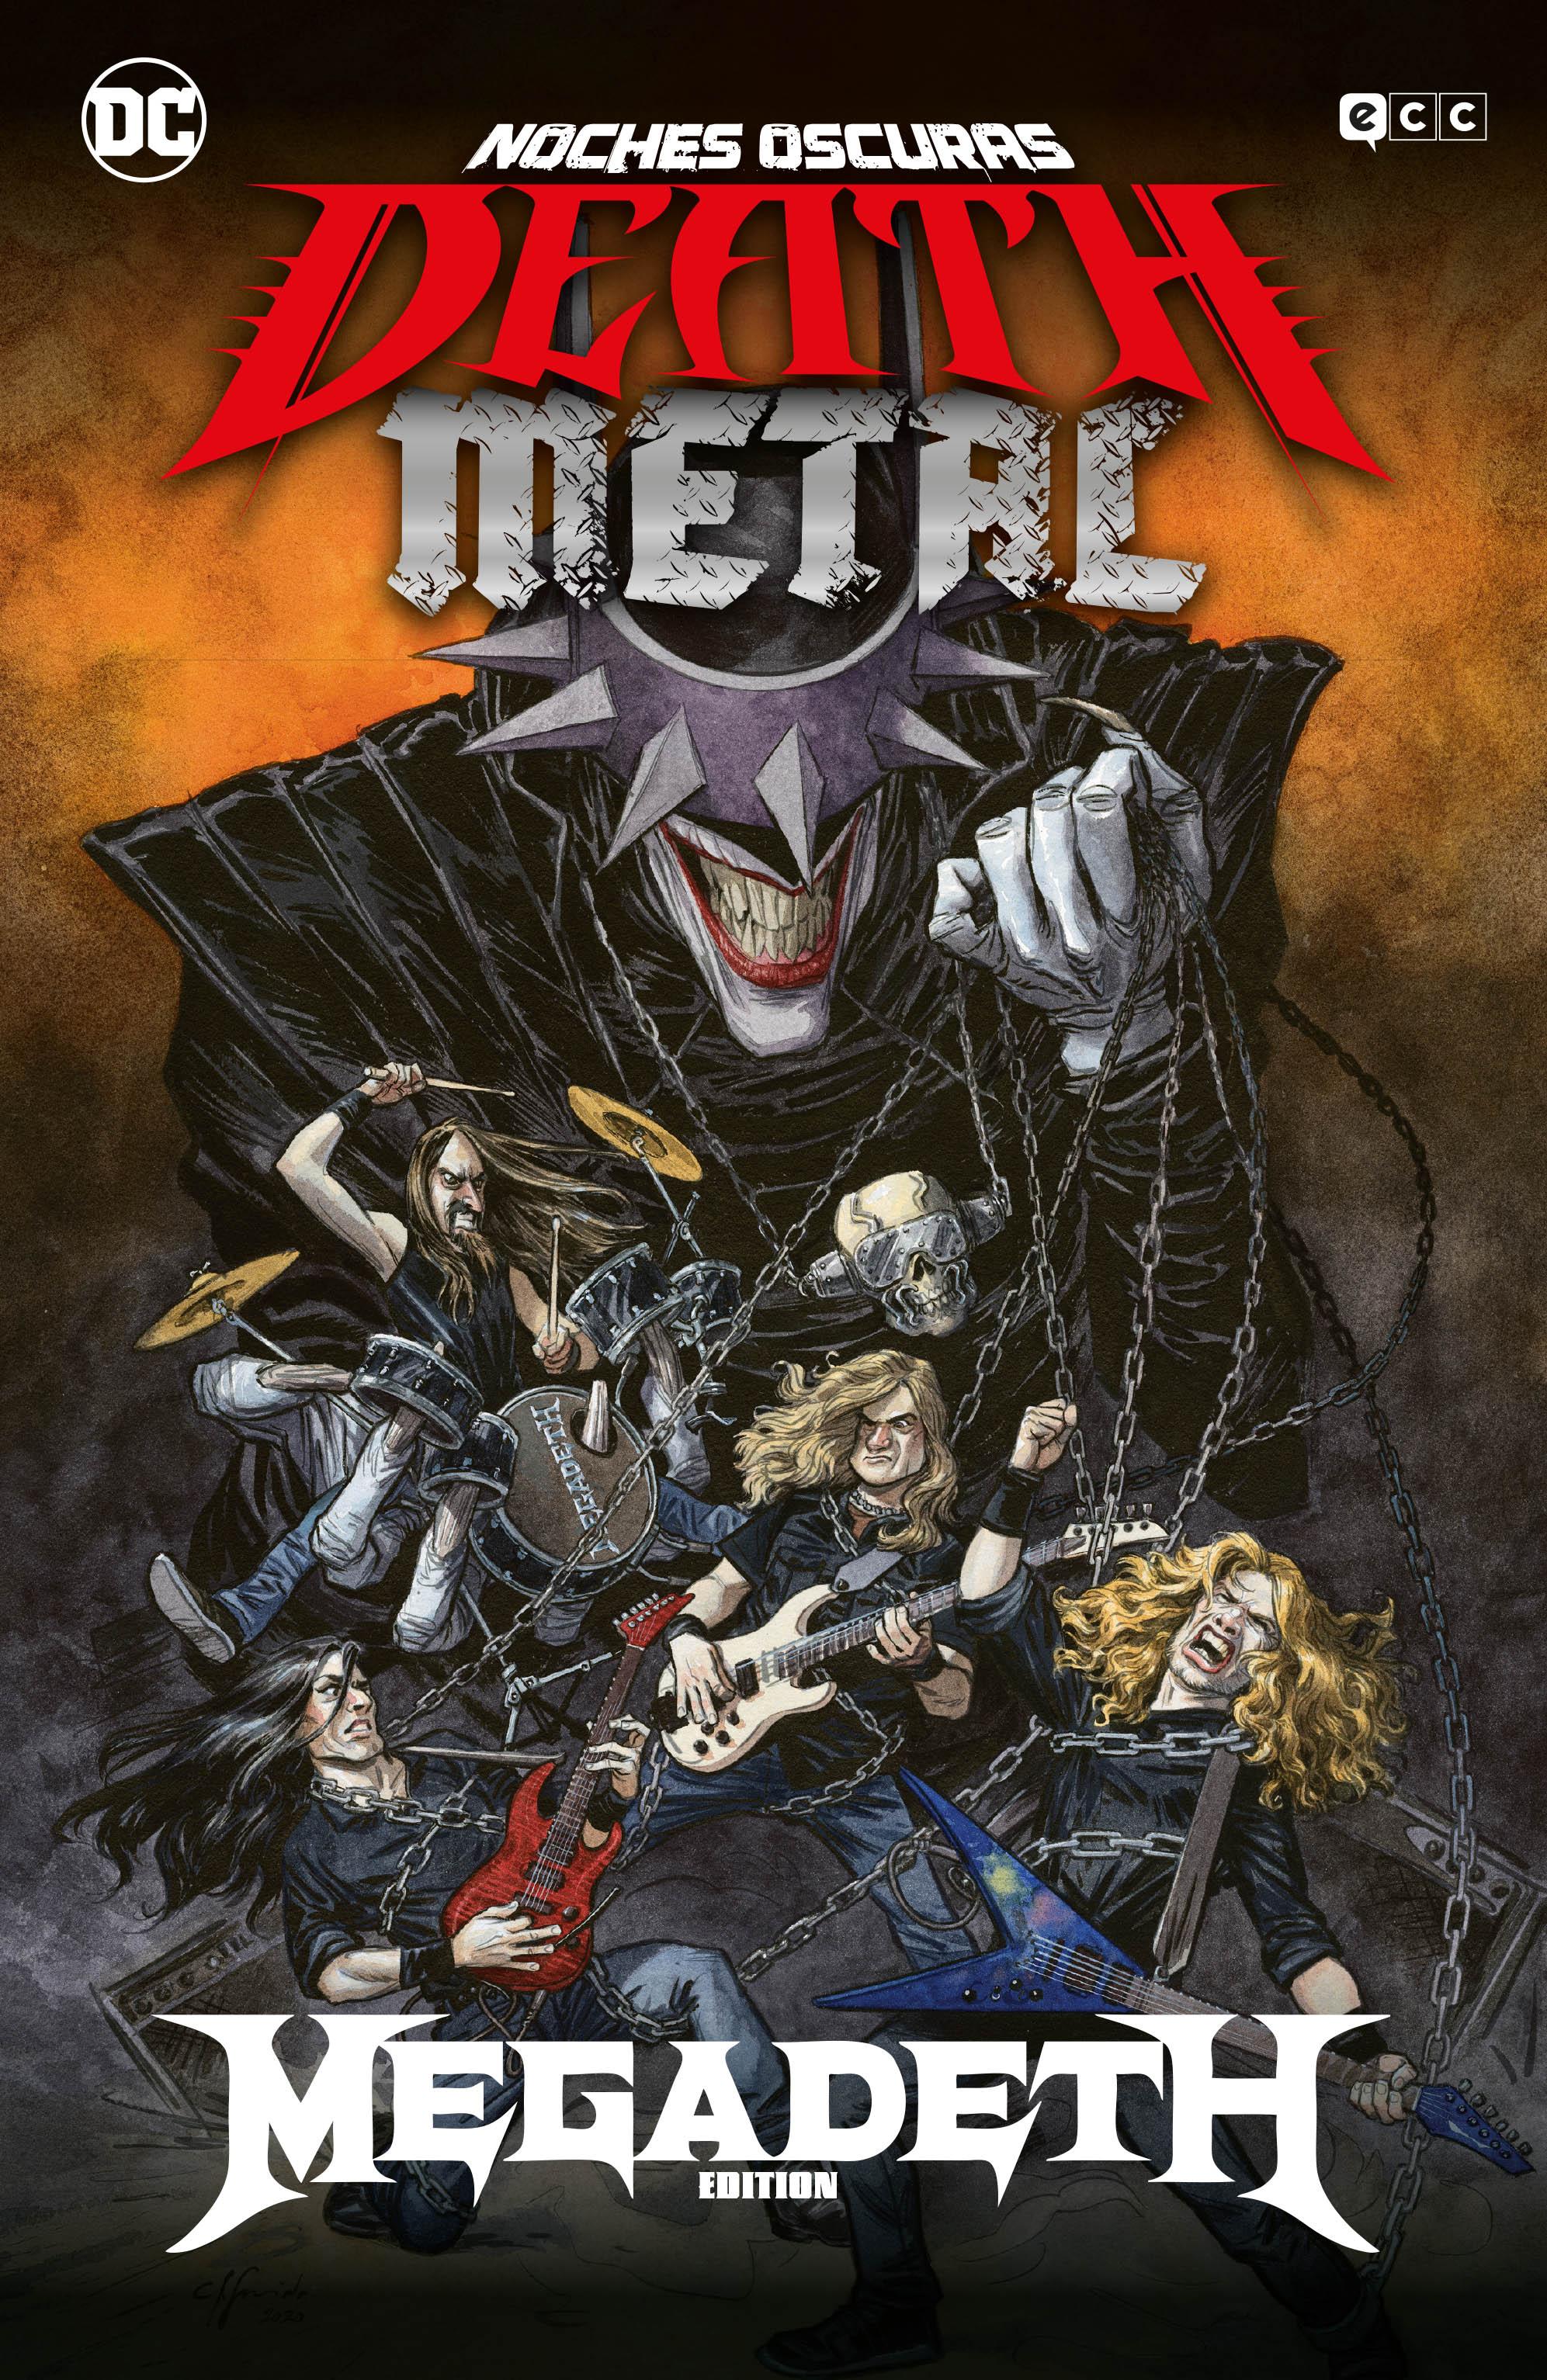 Noches Oscuras: Death Metal #1 (Megadeth Band Edition) y #2 (Ghost Band Edition) (Cartoné)